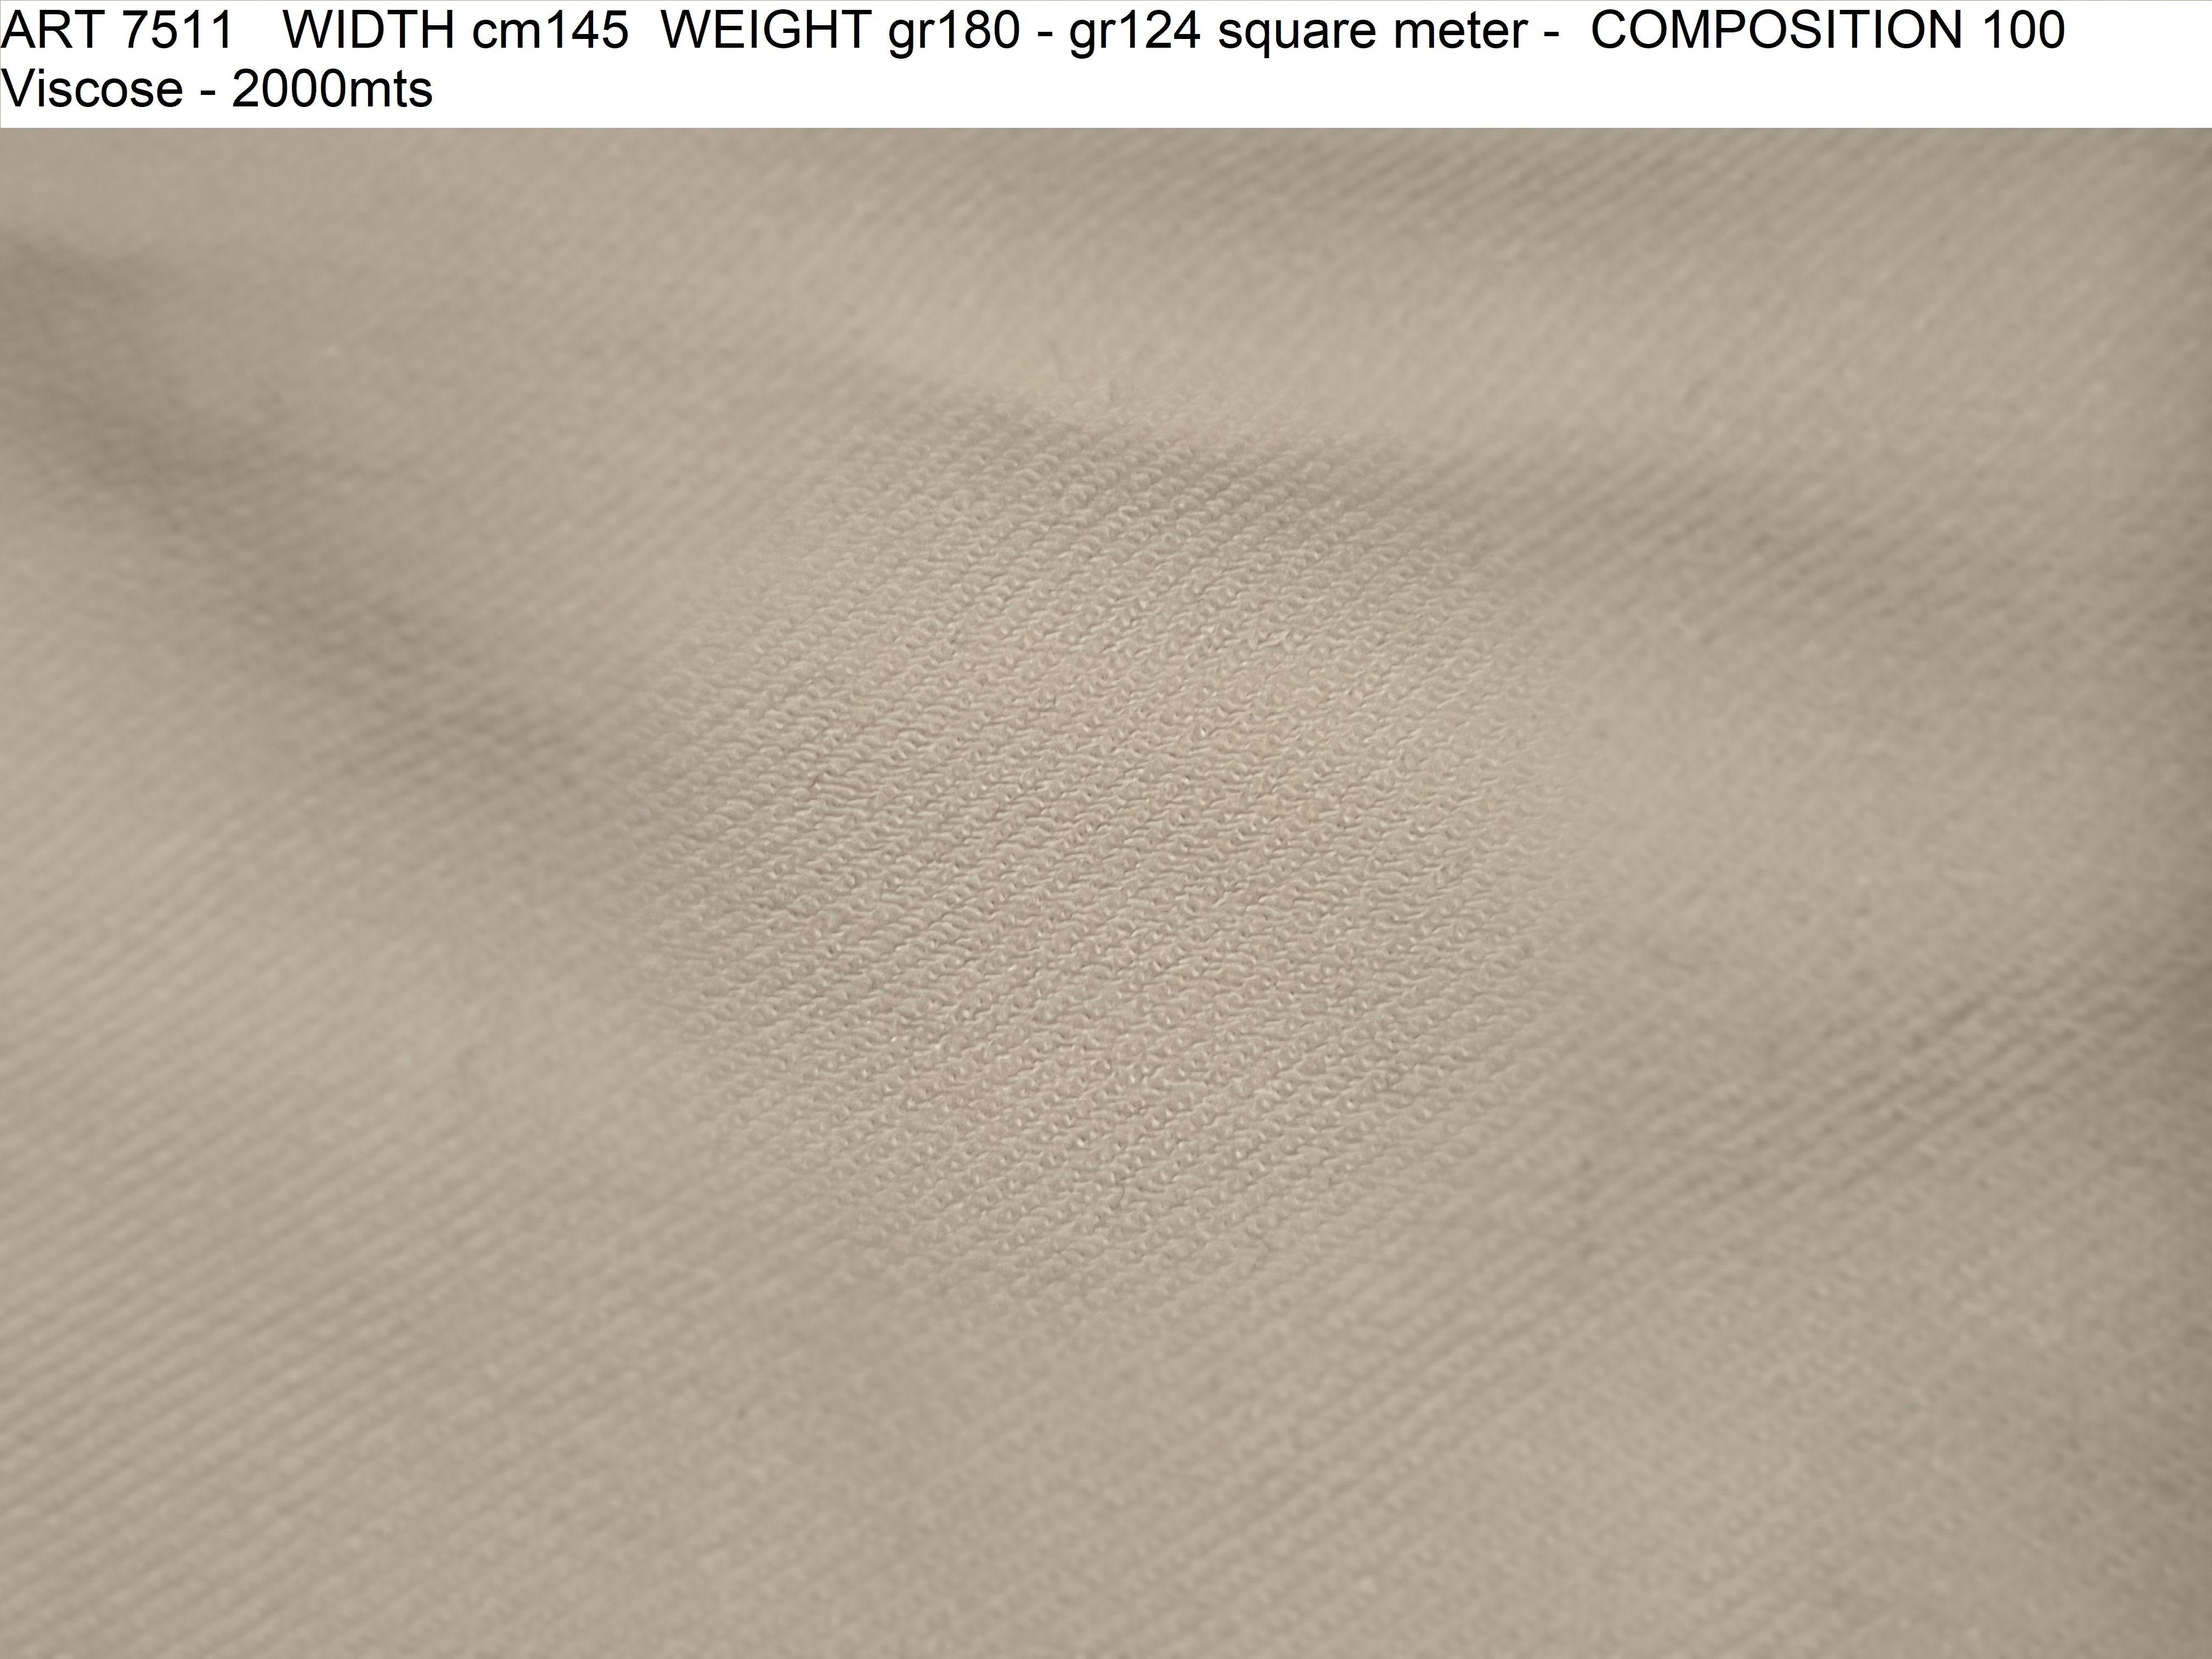 ART 7511 WIDTH cm145 WEIGHT gr180 - gr124 square meter - COMPOSITION 100 Viscose - 2000mts